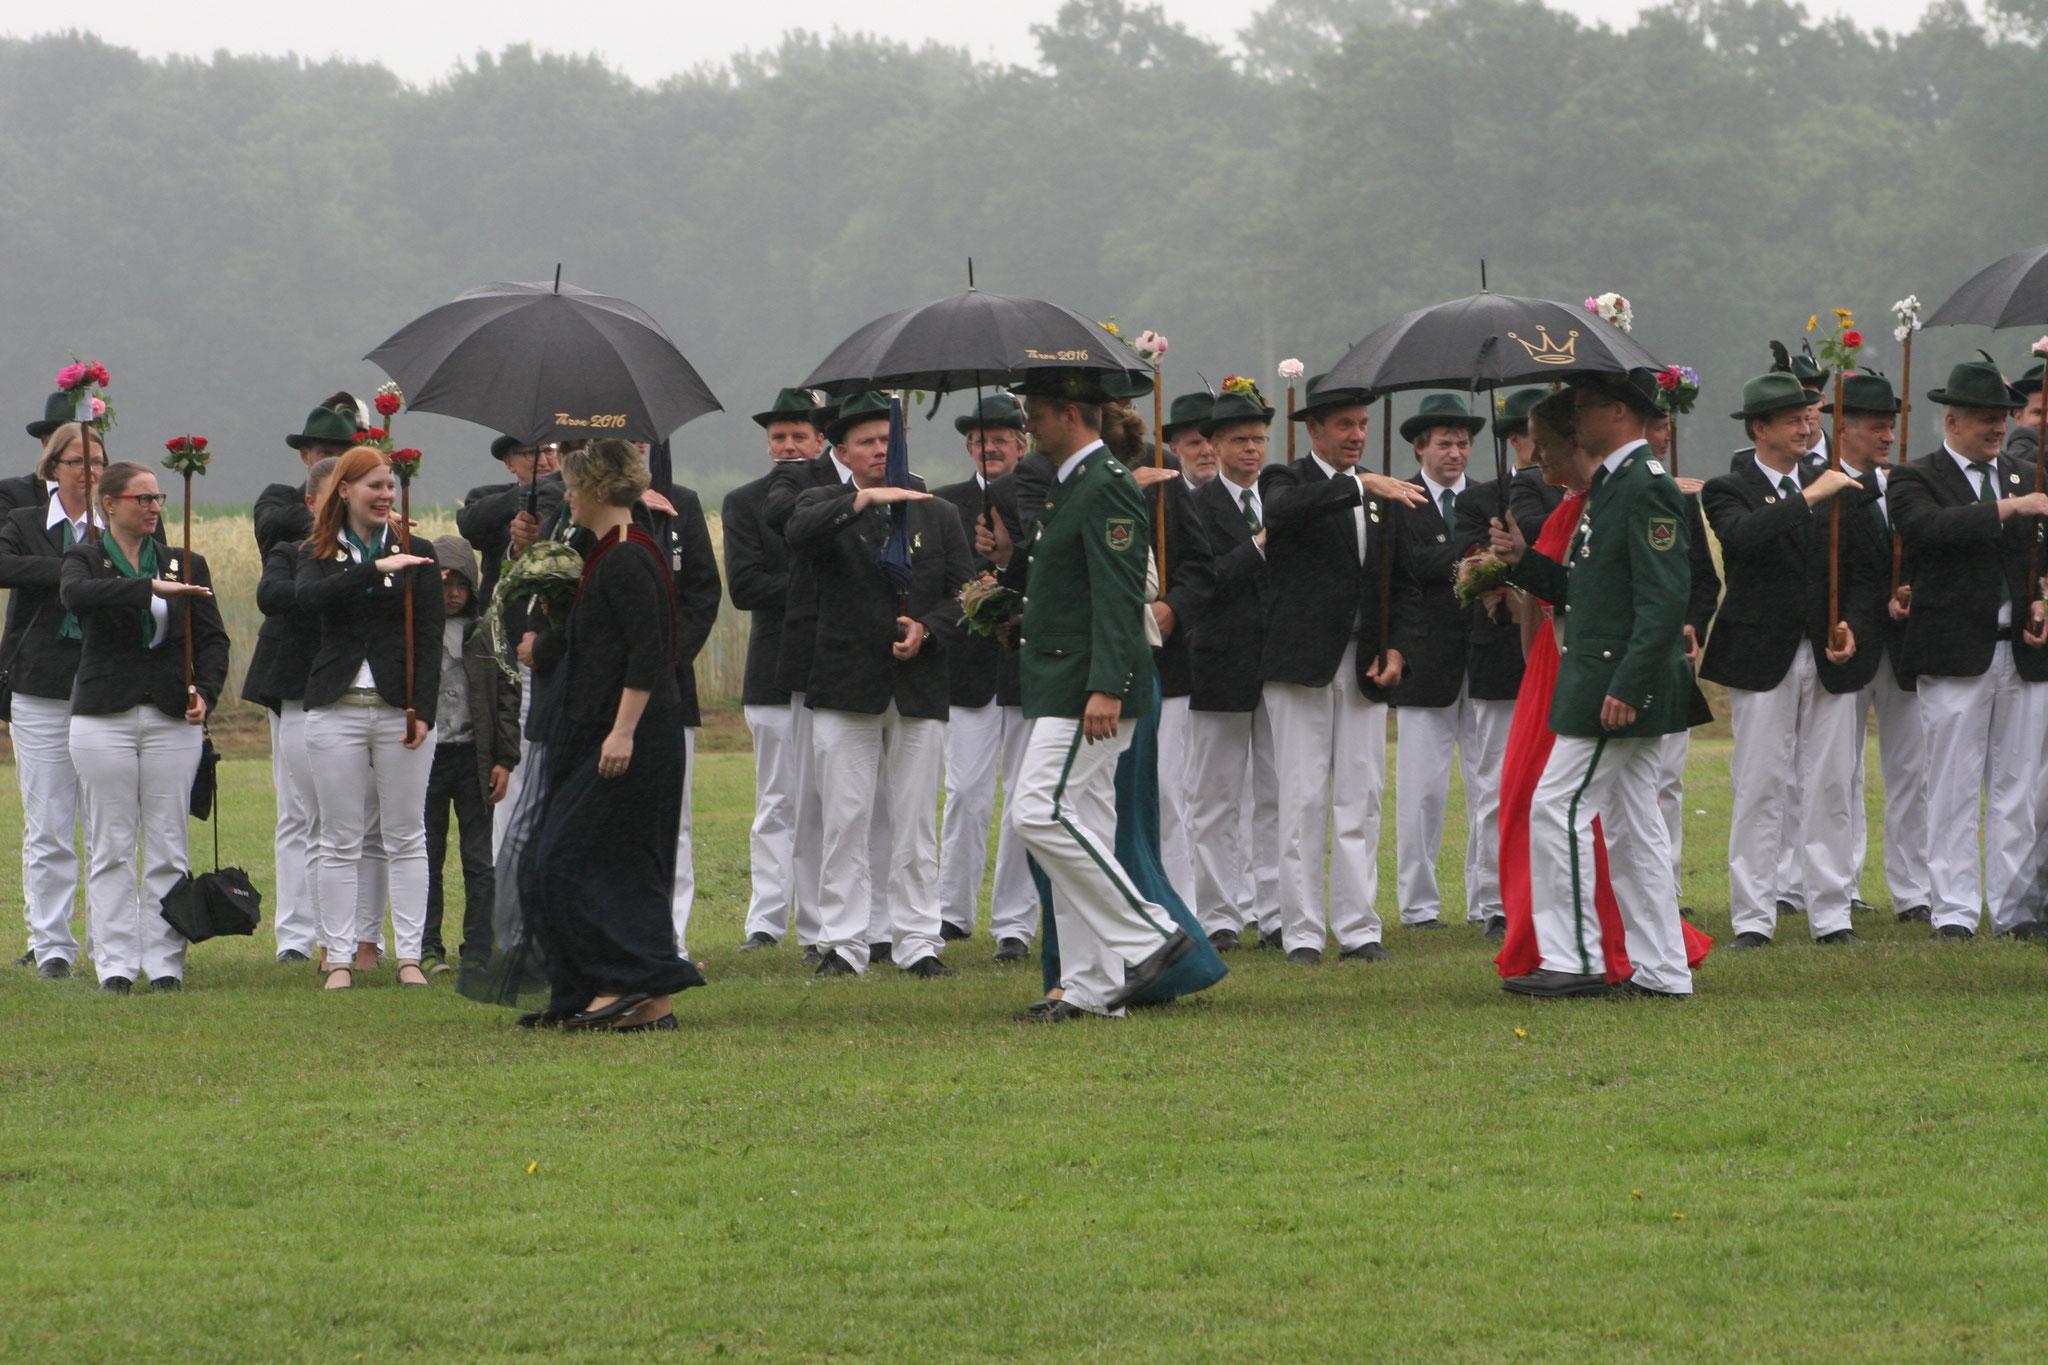 Abnahme der Parade (bei Regen)